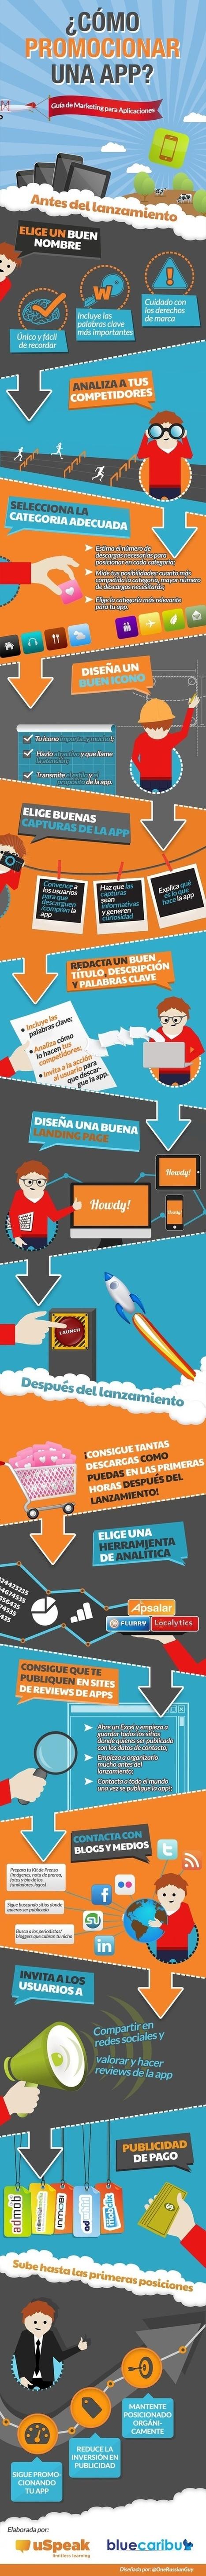 Marketing | Mercadillo Social Media | Scoop.it